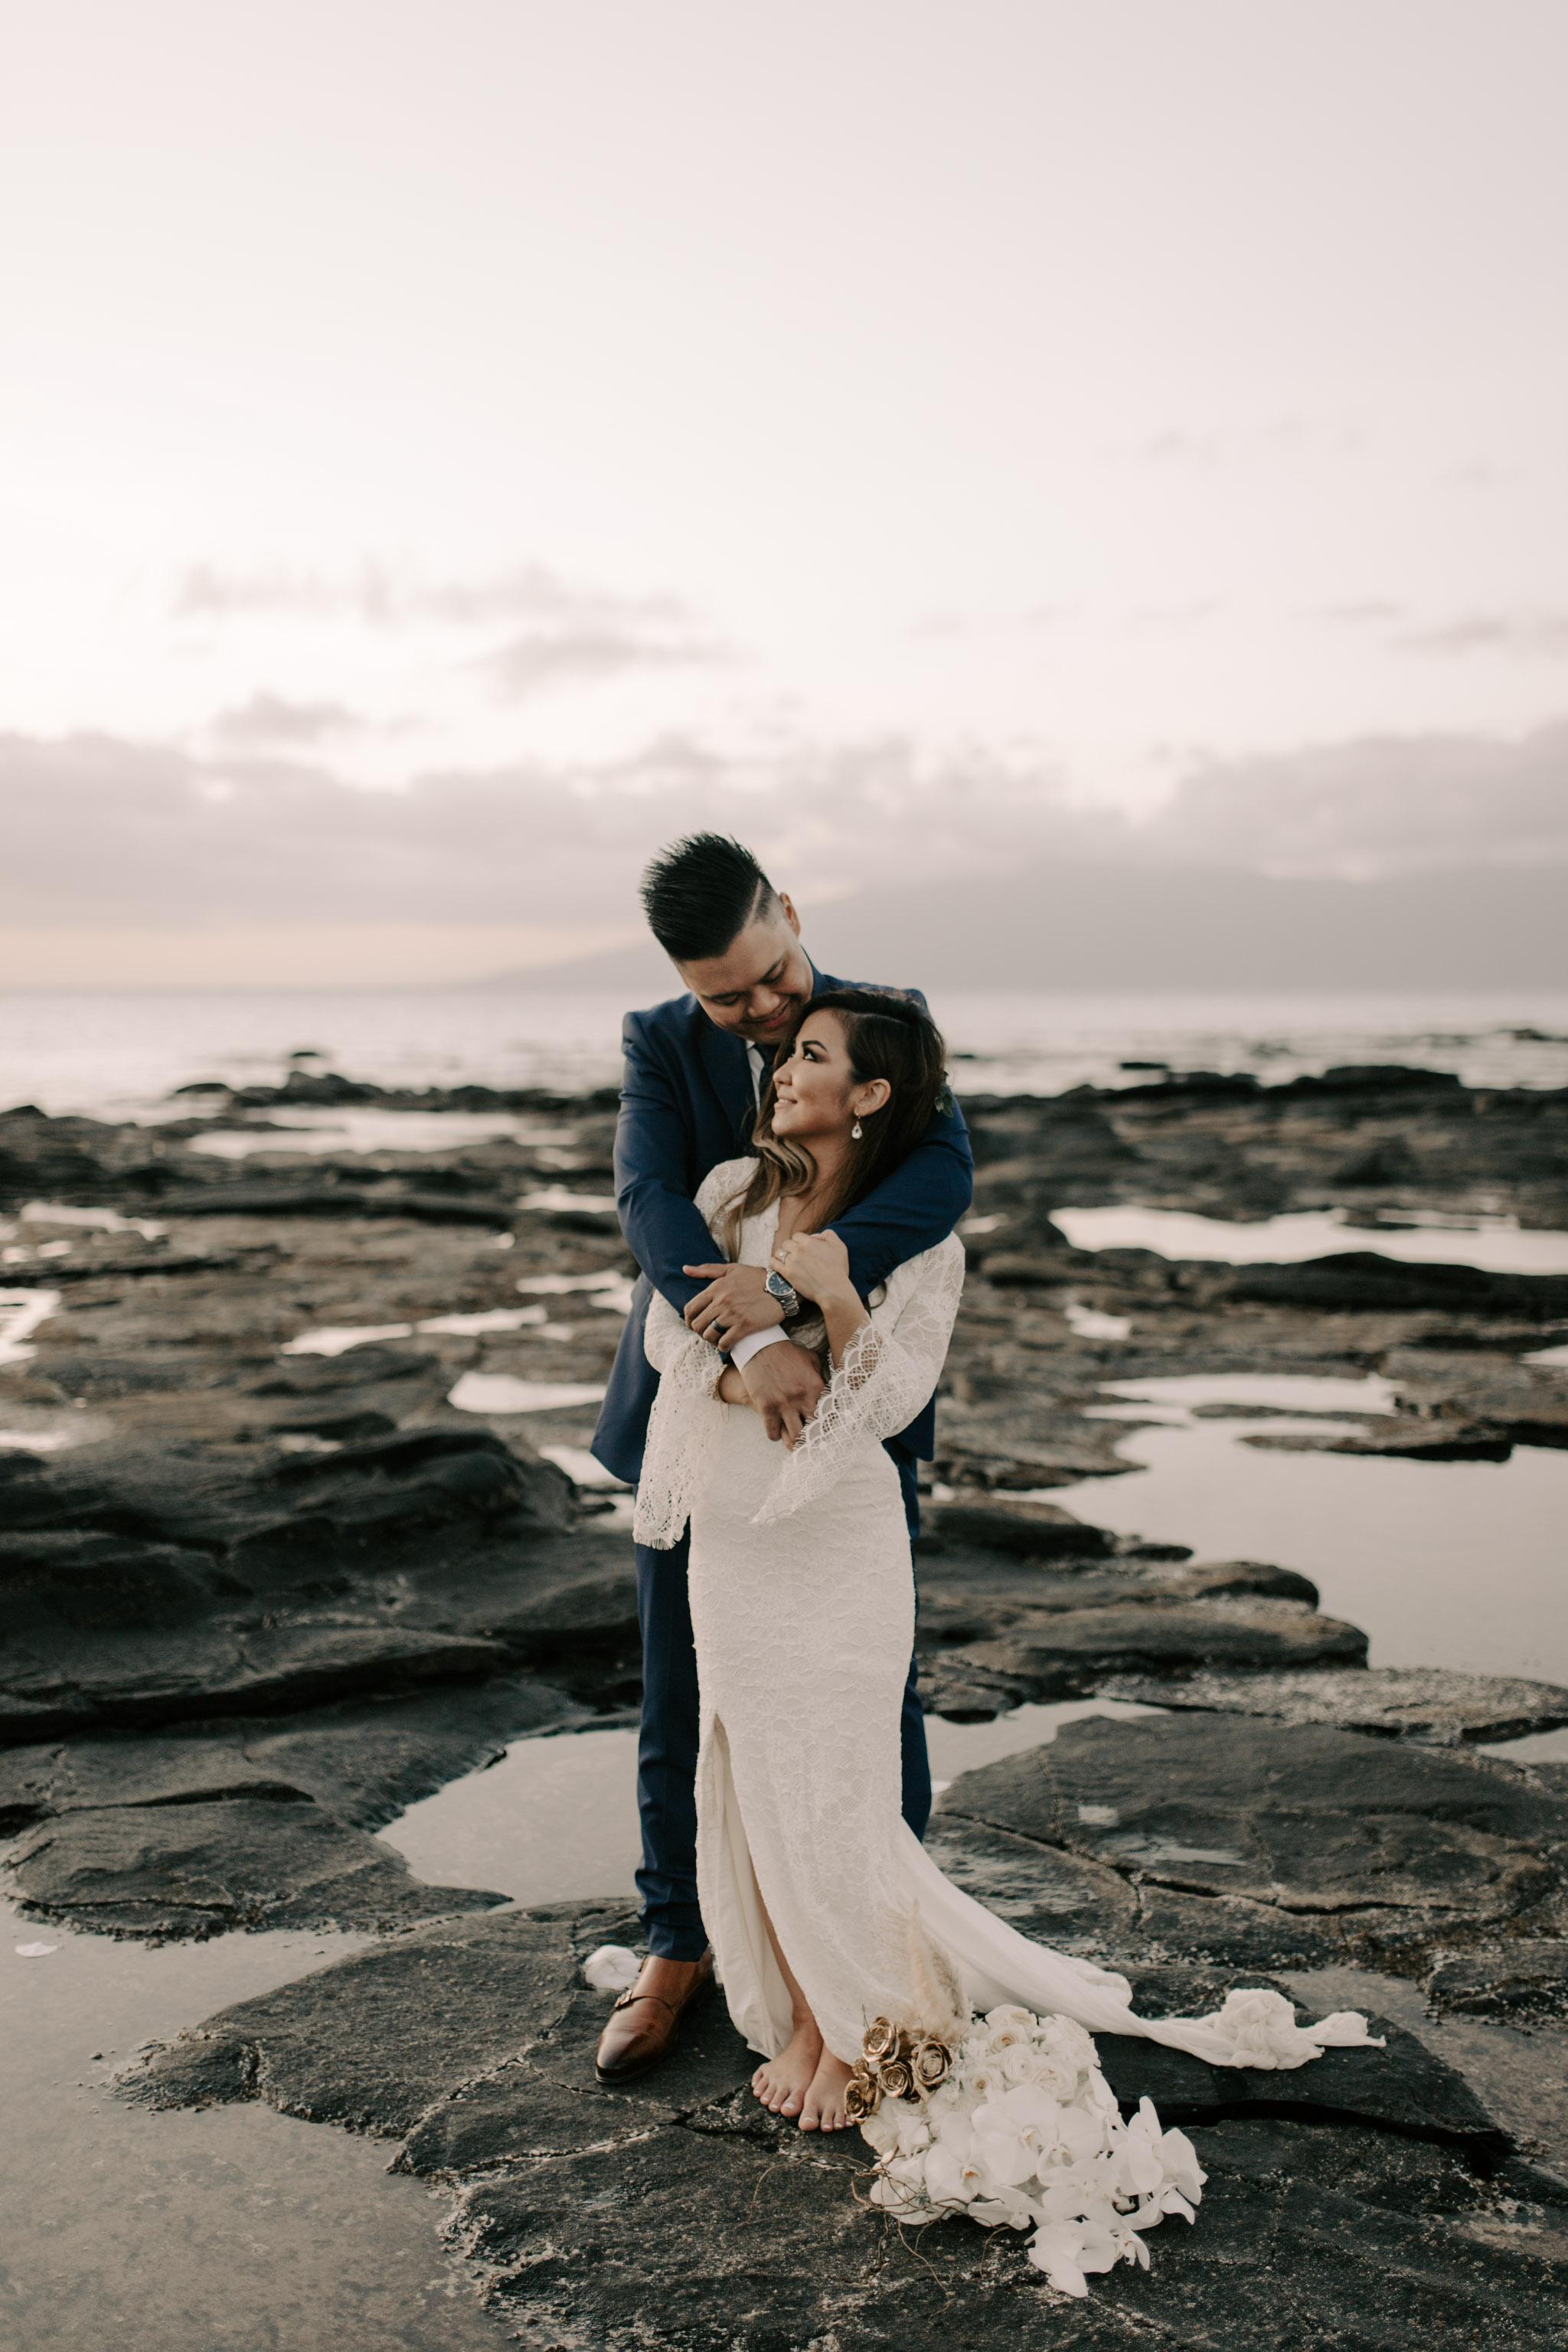 Beautiful Maui Wedding Photos   Merriman's Kapalua Maui wedding by Hawaii wedding photographer Desiree Leilani